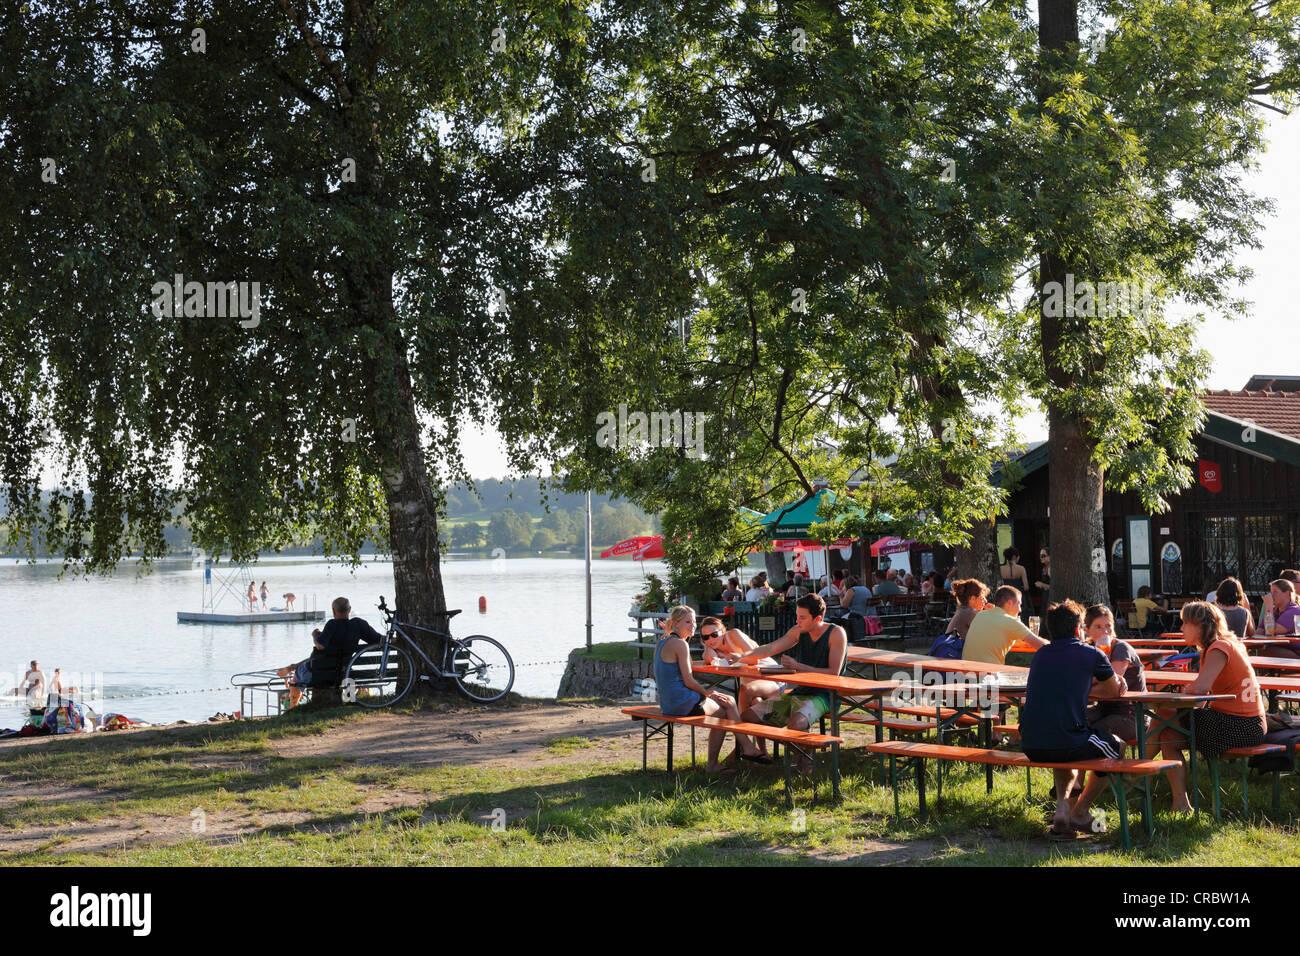 Guests in a beer garden, Strandbad Tengling, Lake Tachinger, Rupertiwinkel, Upper Bavaria, Bavaria, Germany, Europe - Stock Image